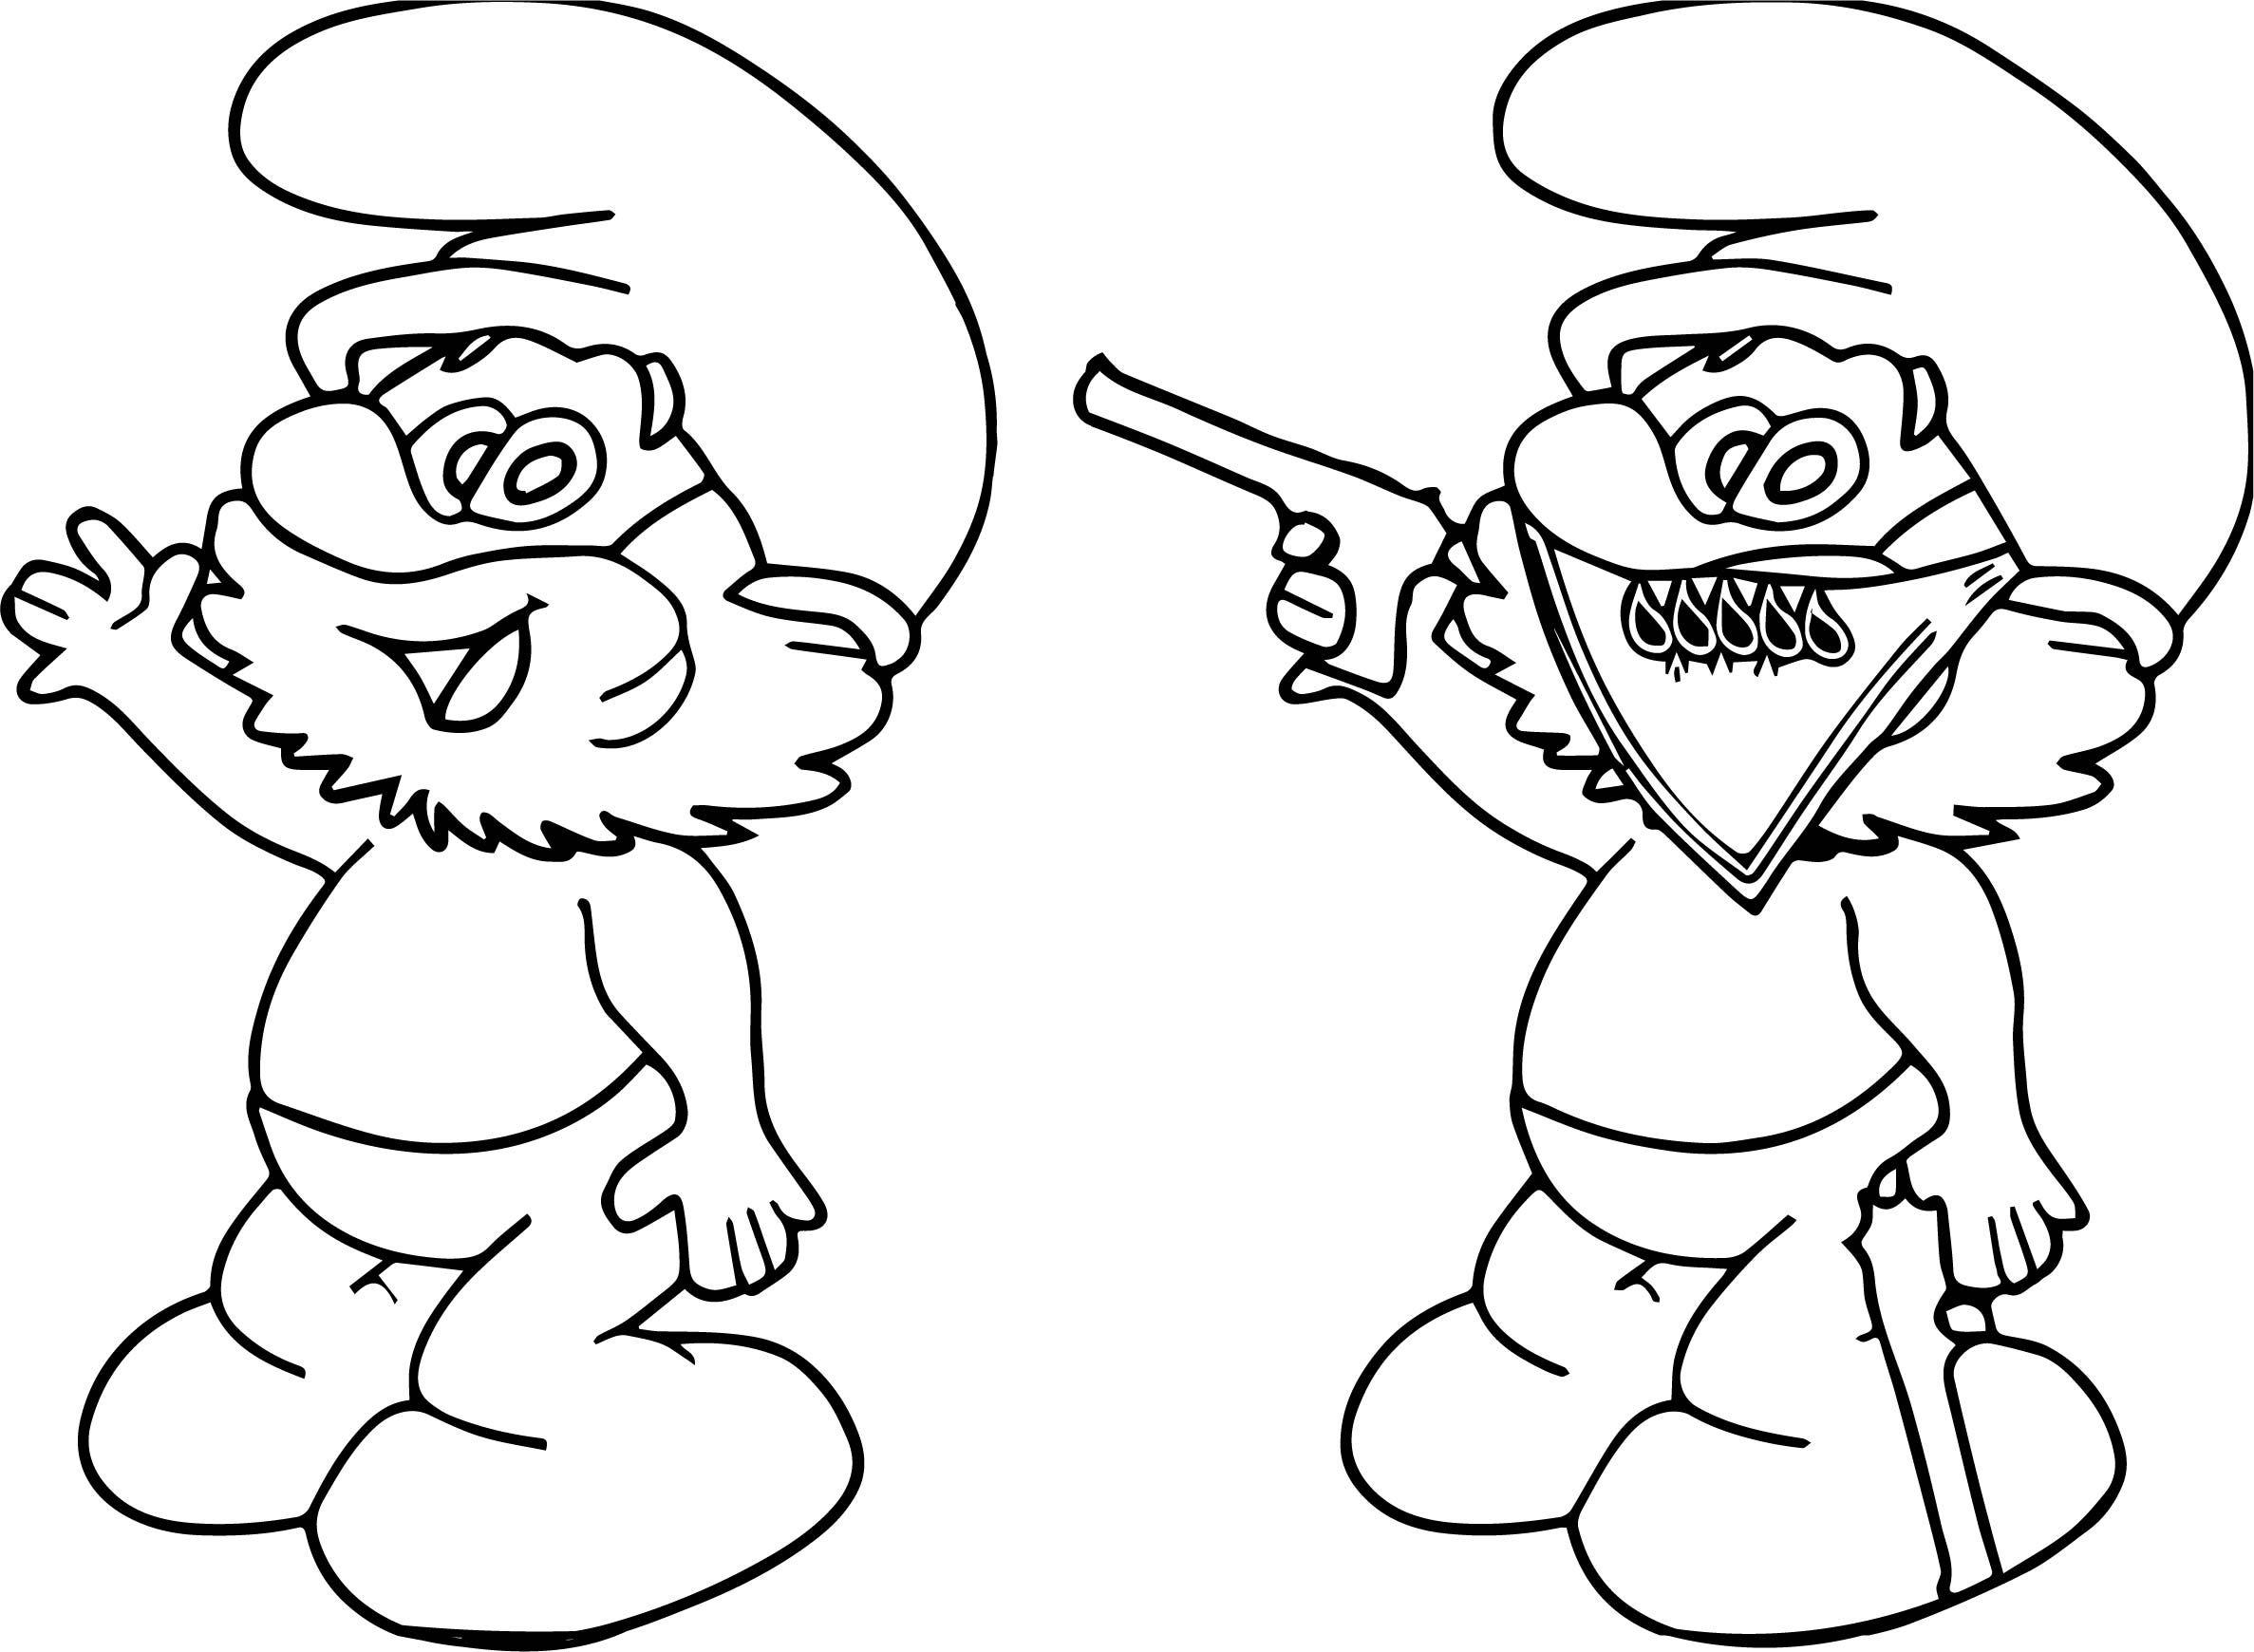 Good Papa Smurf Vs Gang Papa Smurf Coloring Page